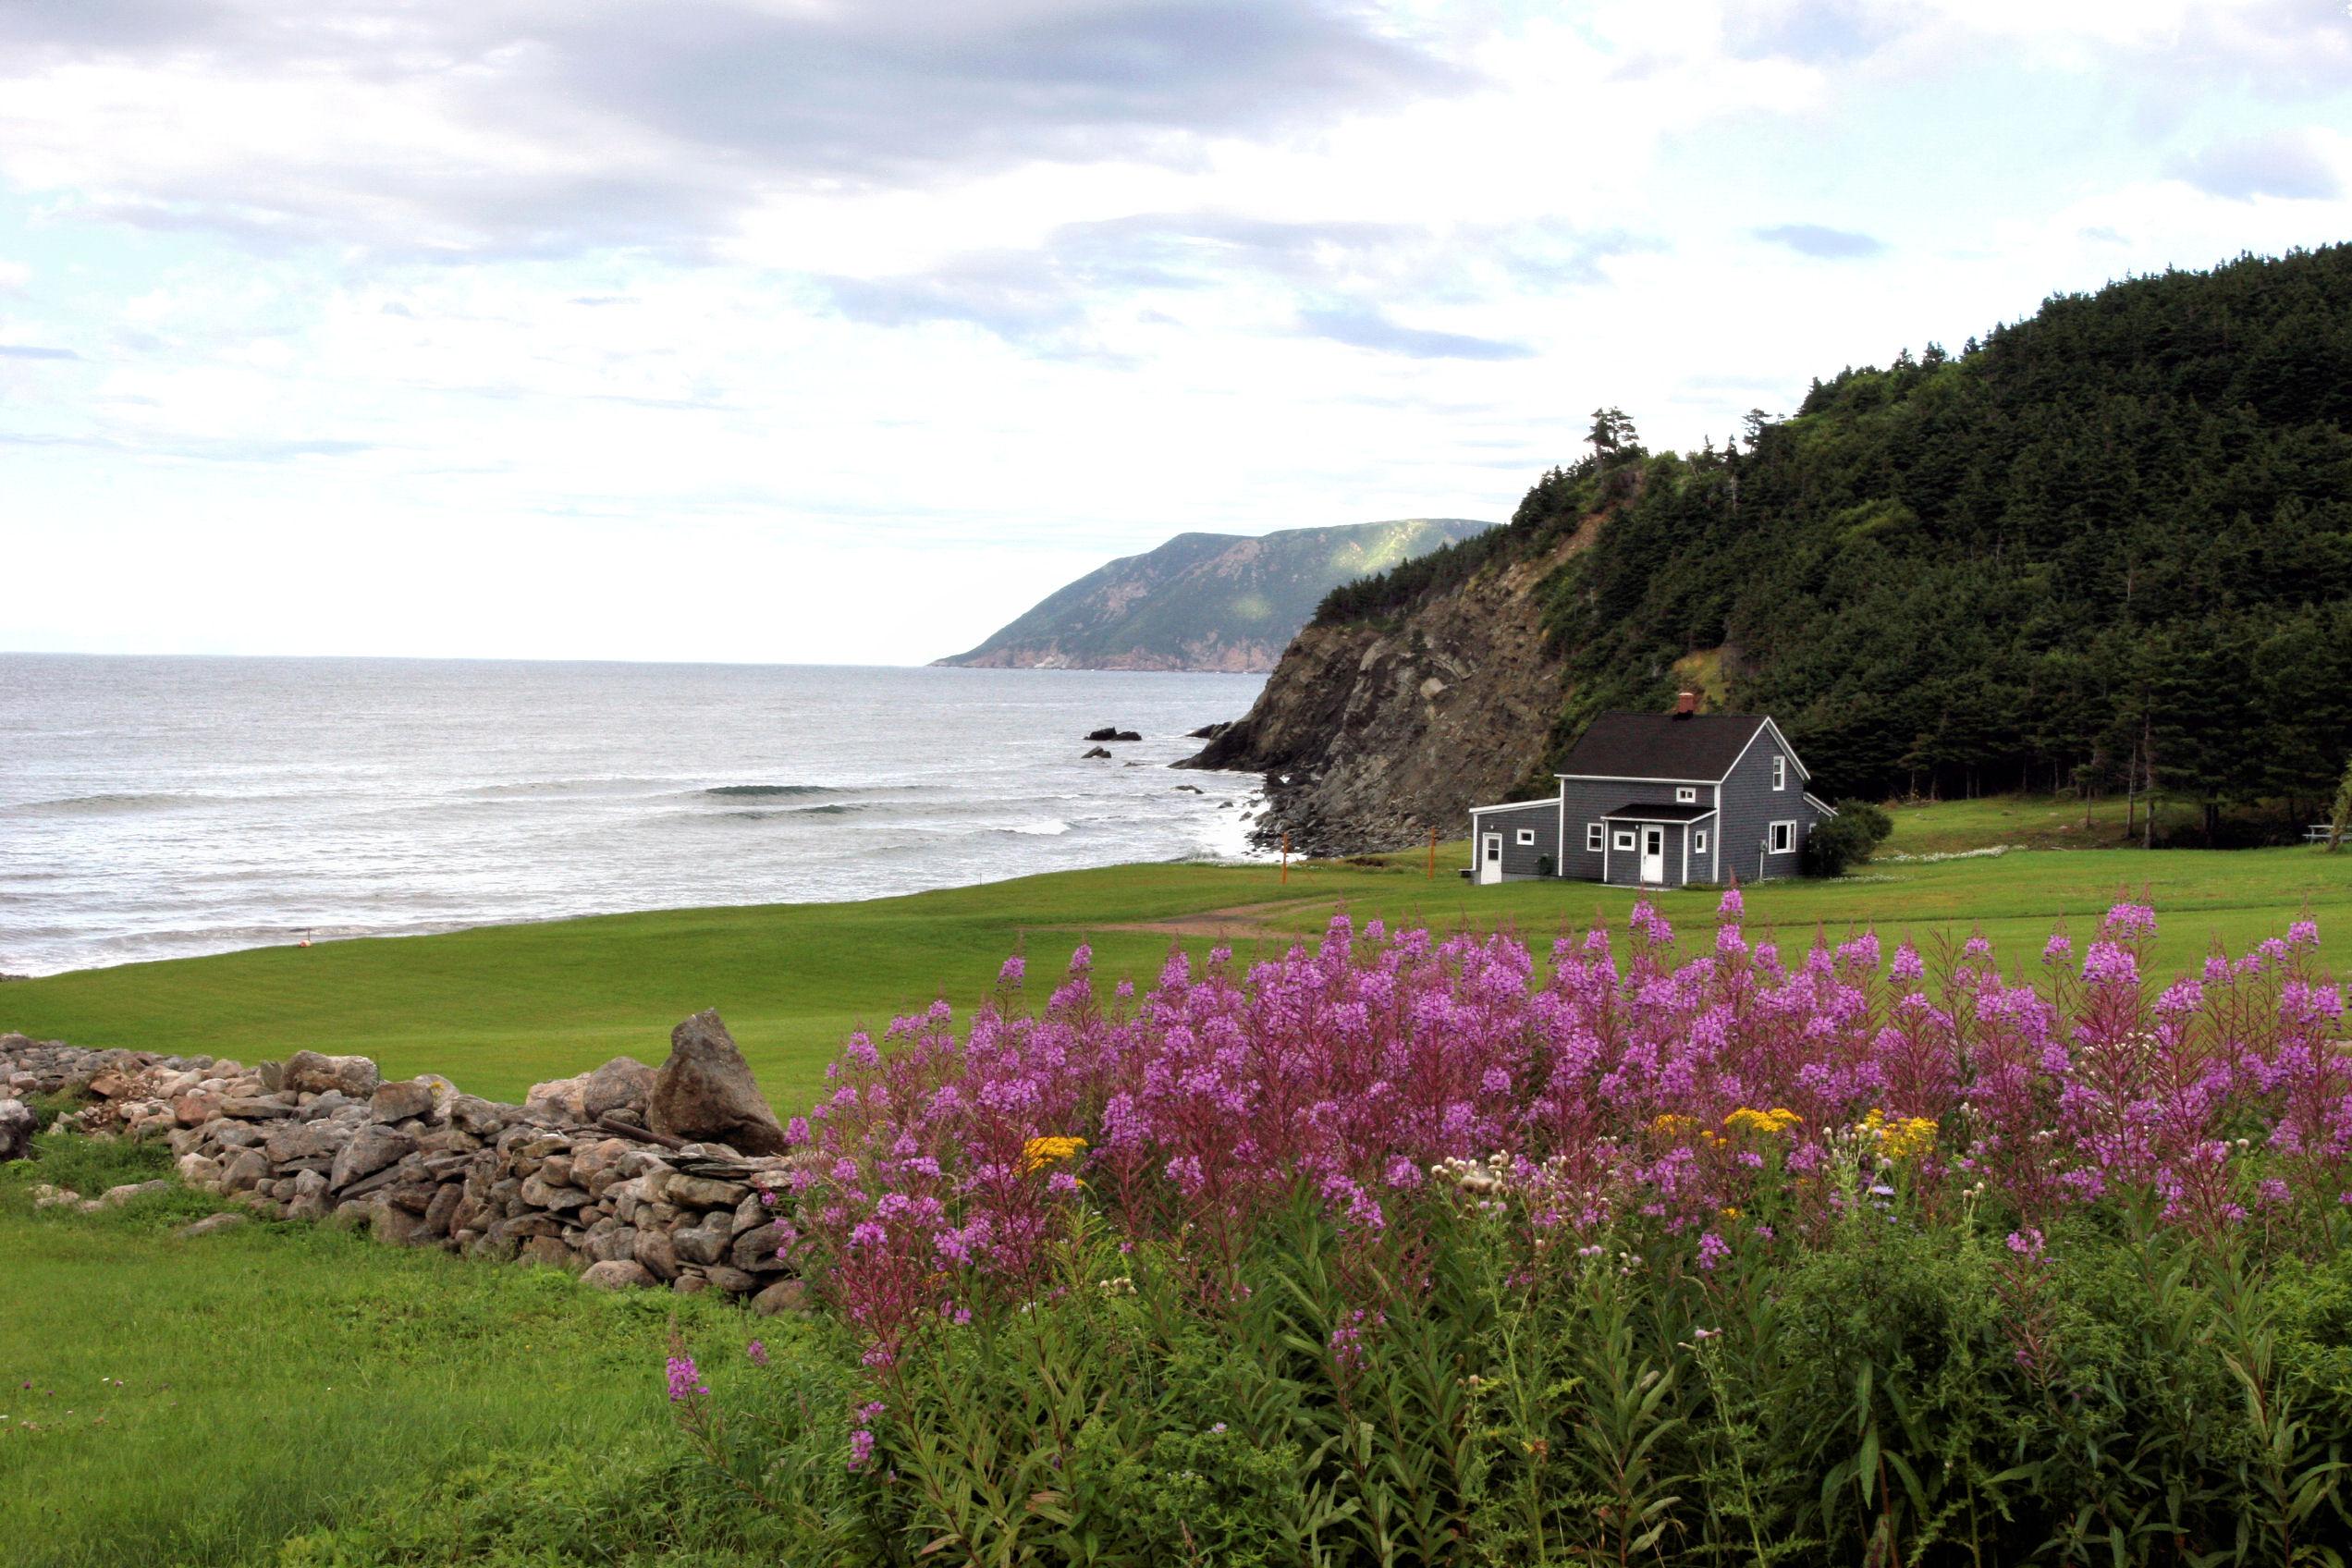 Cape Breton Island, Meat Cove area, Nova Scotia